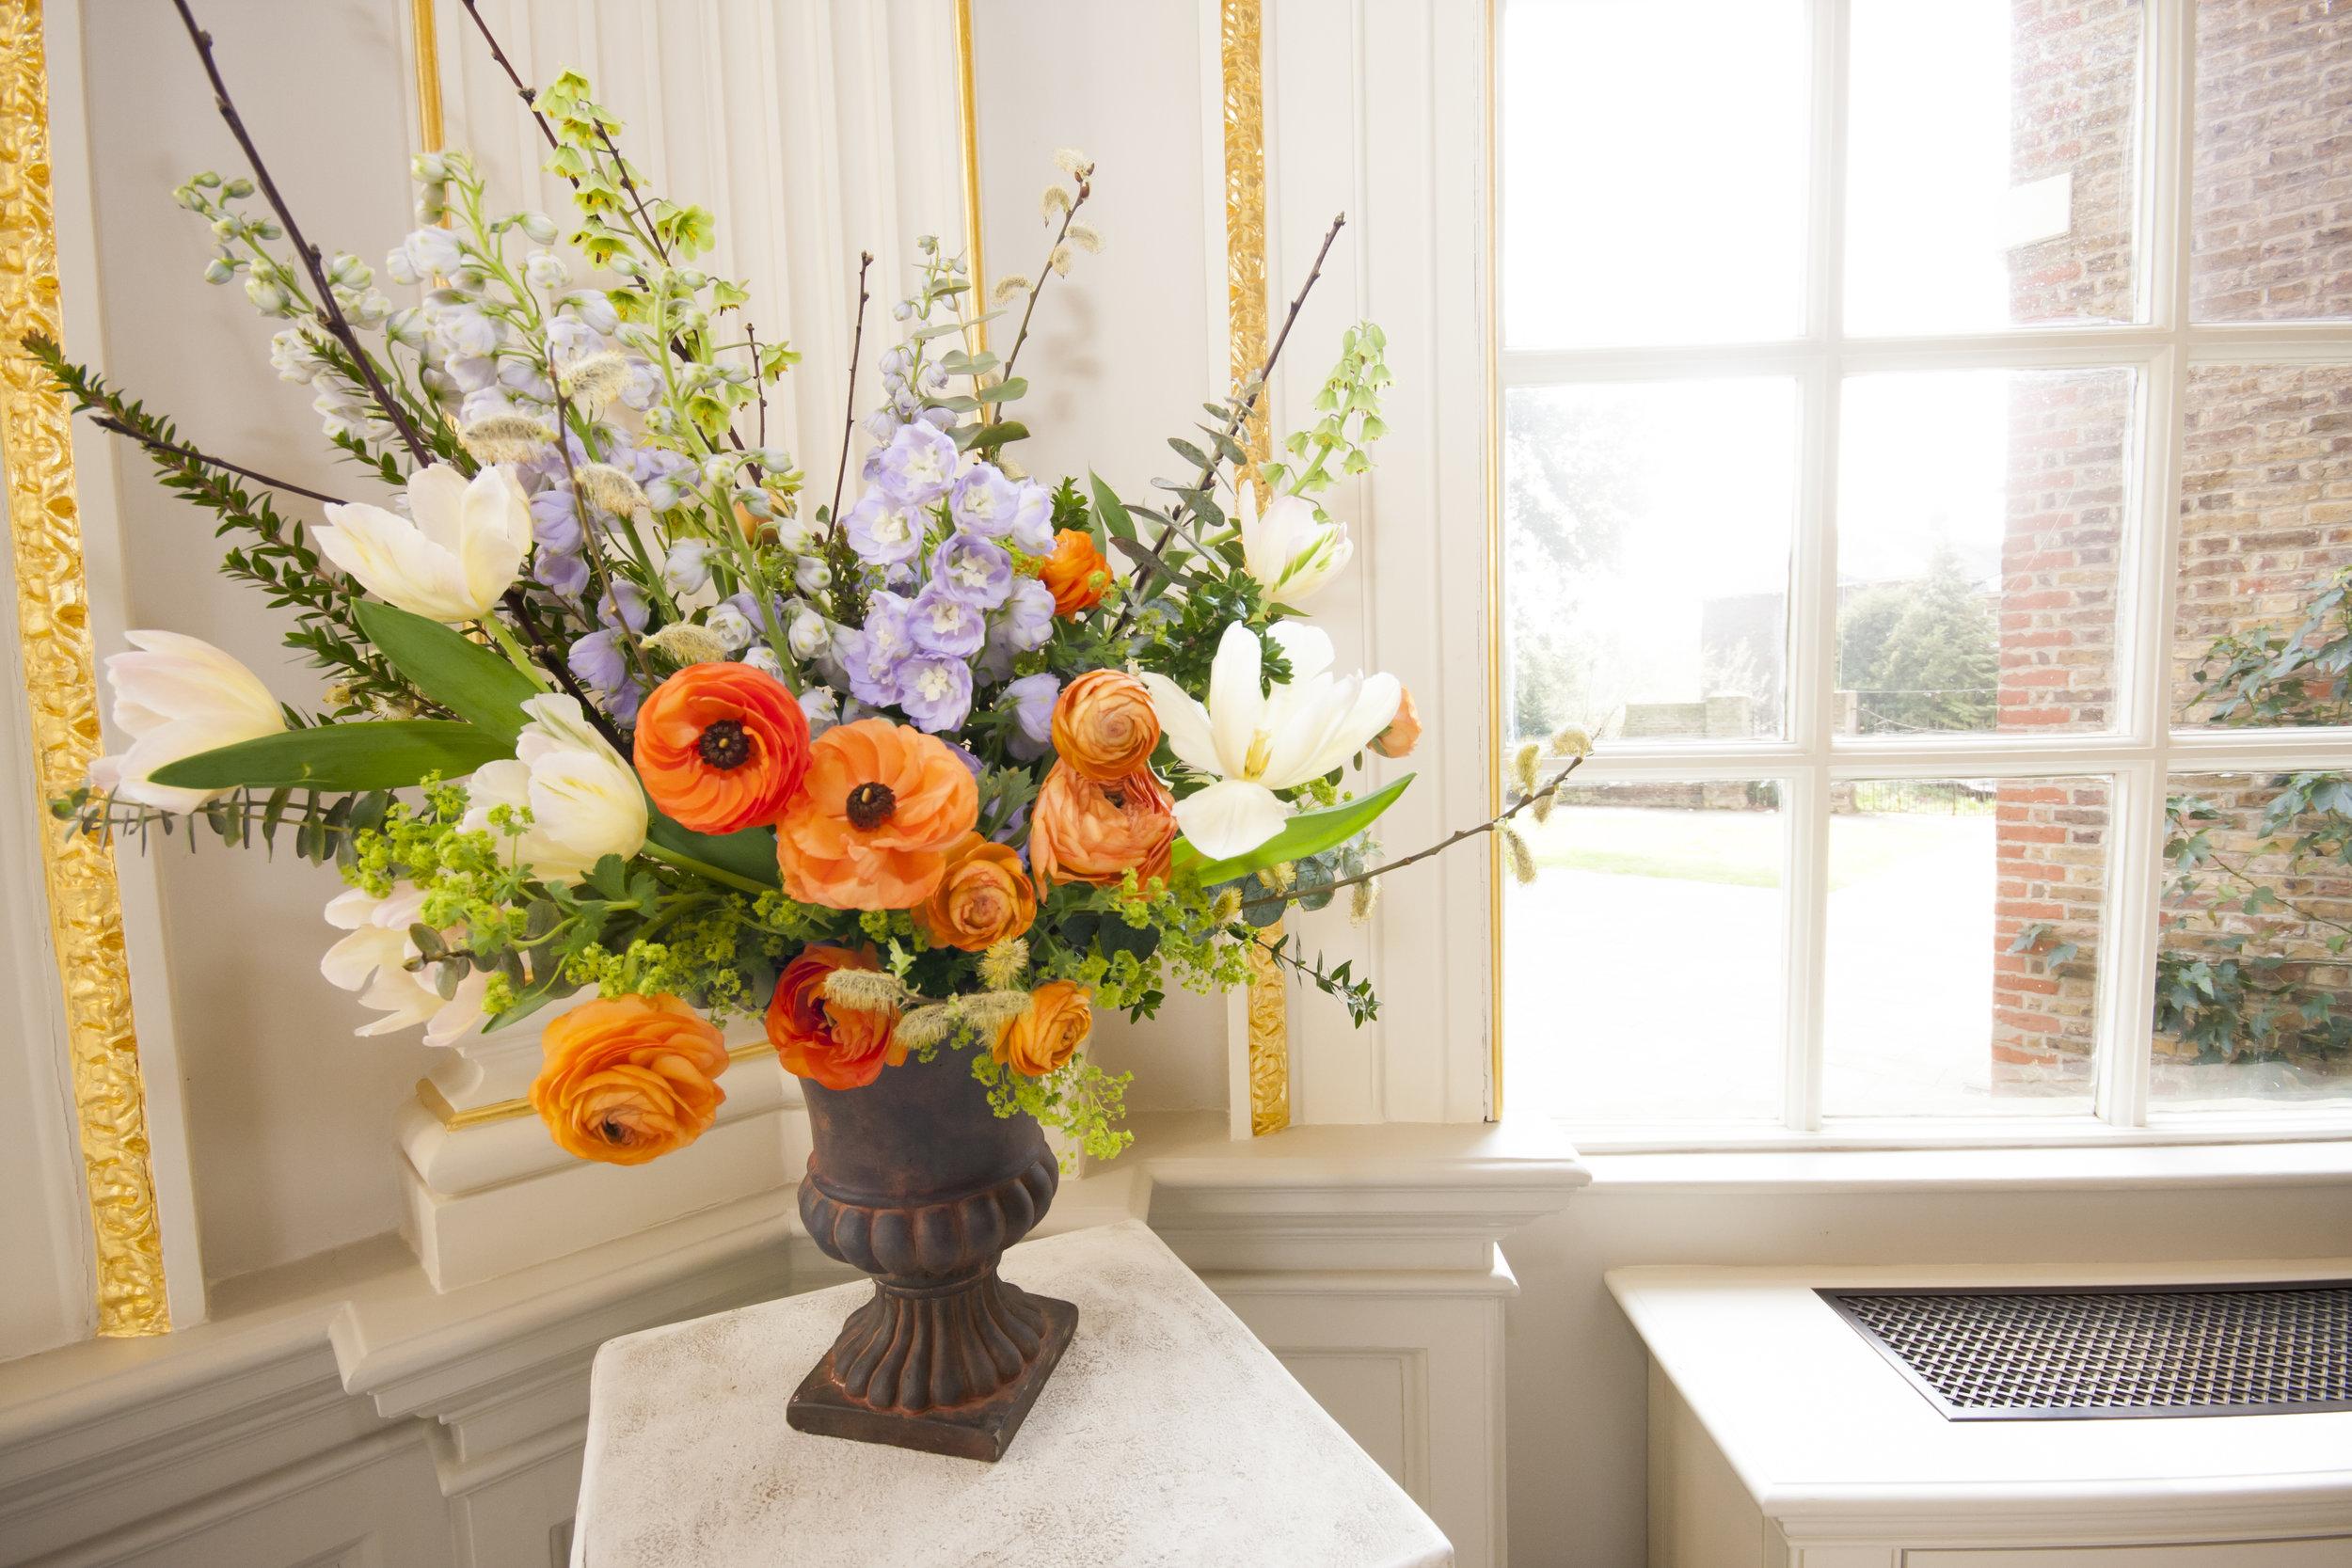 Orleans_House_Twickenham_Wedding_flowers.jpg